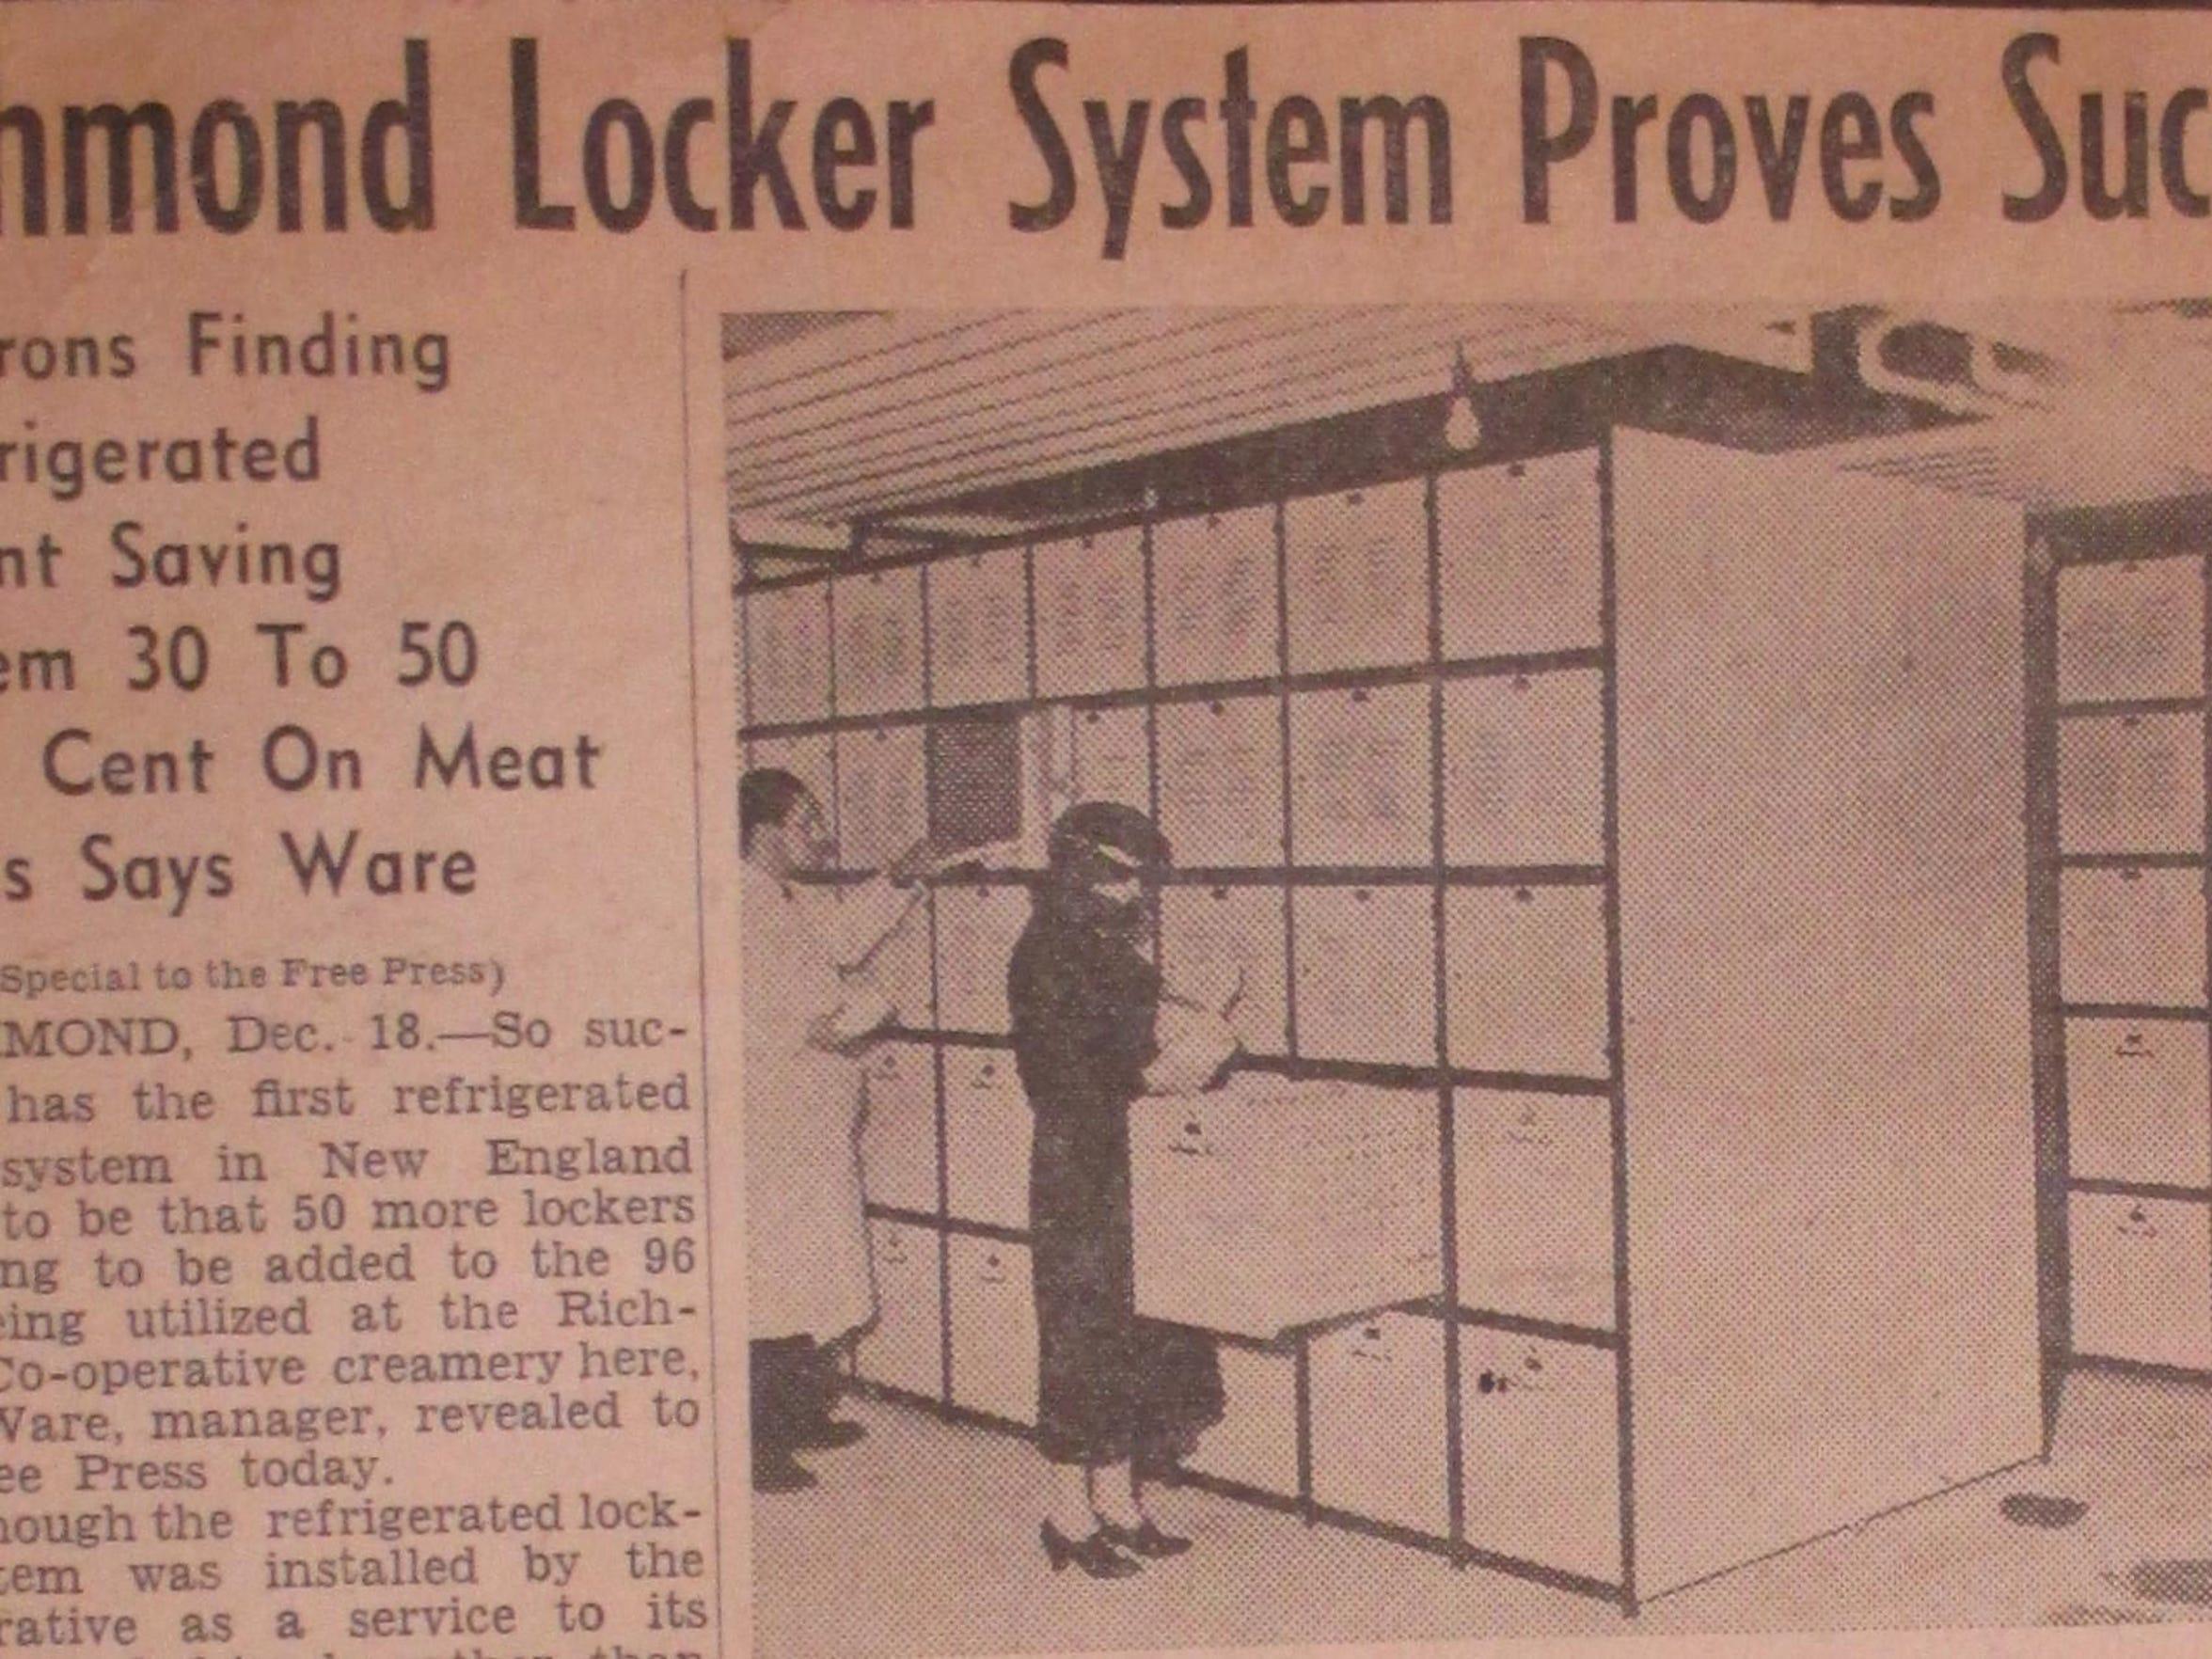 9. Refrigerated lockers